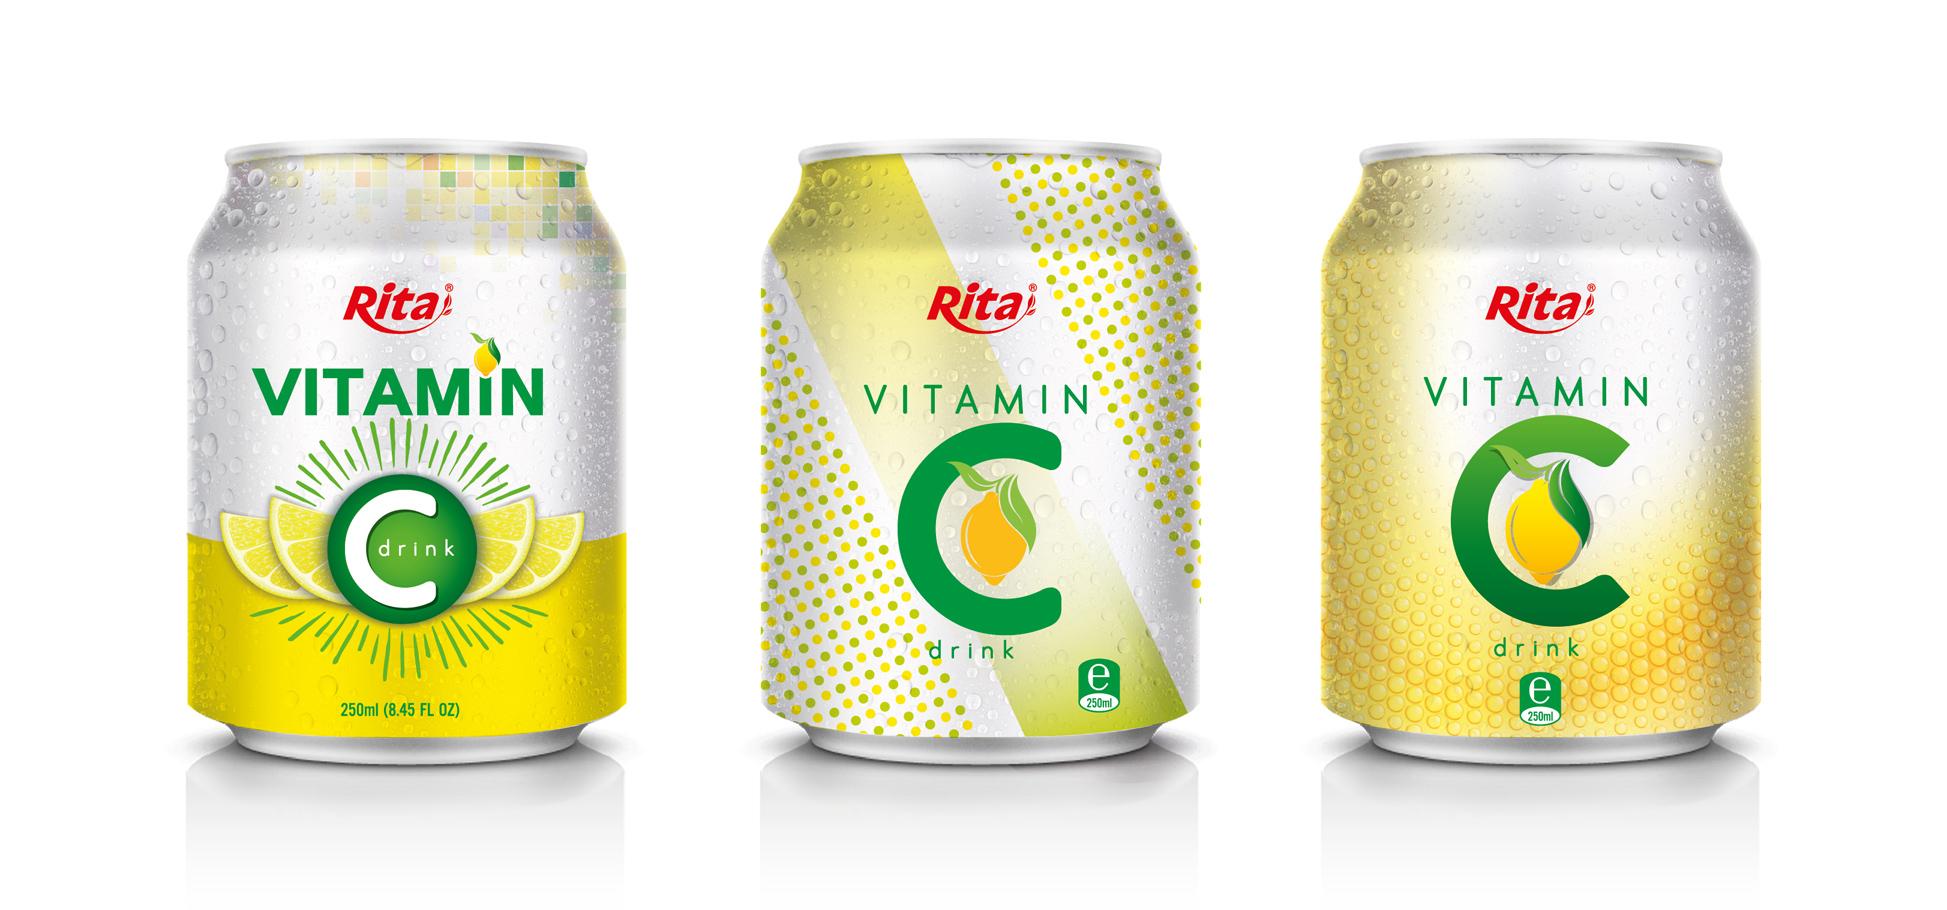 vitamin C drink 250ml can